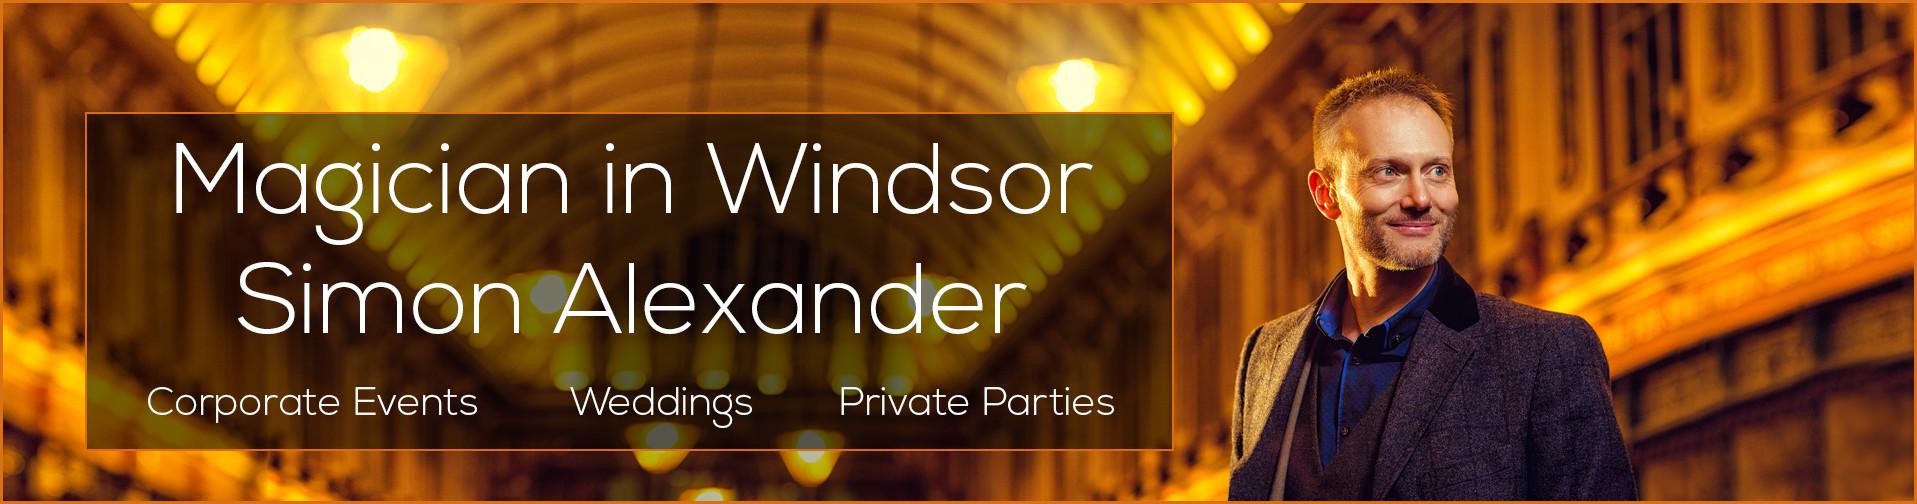 Magician in Windsor Banner